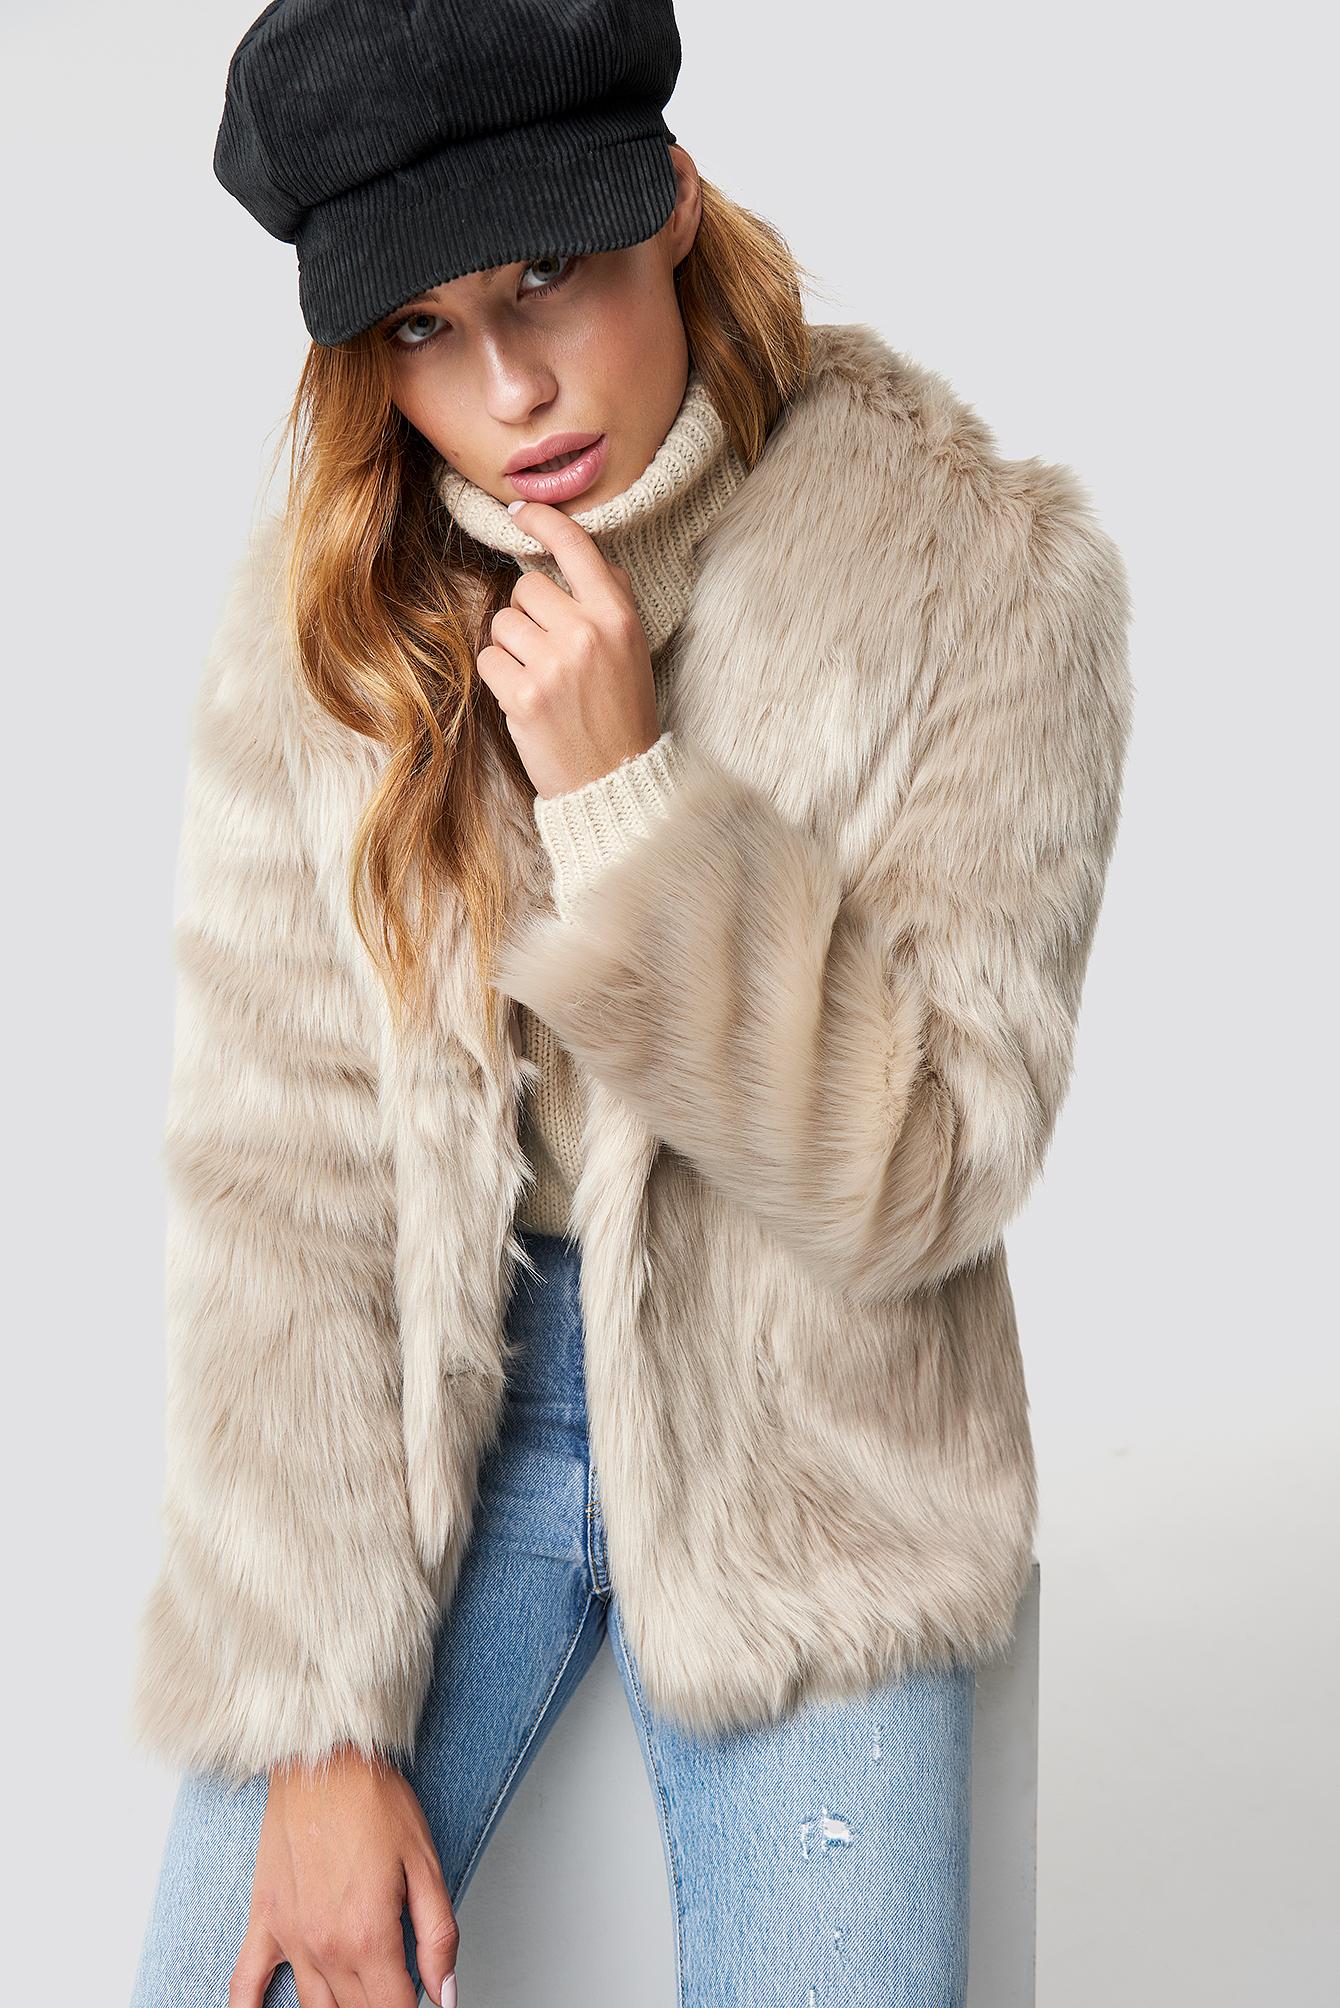 linn ahlborg x na-kd -  Classic Faux Fur Jacket - Beige